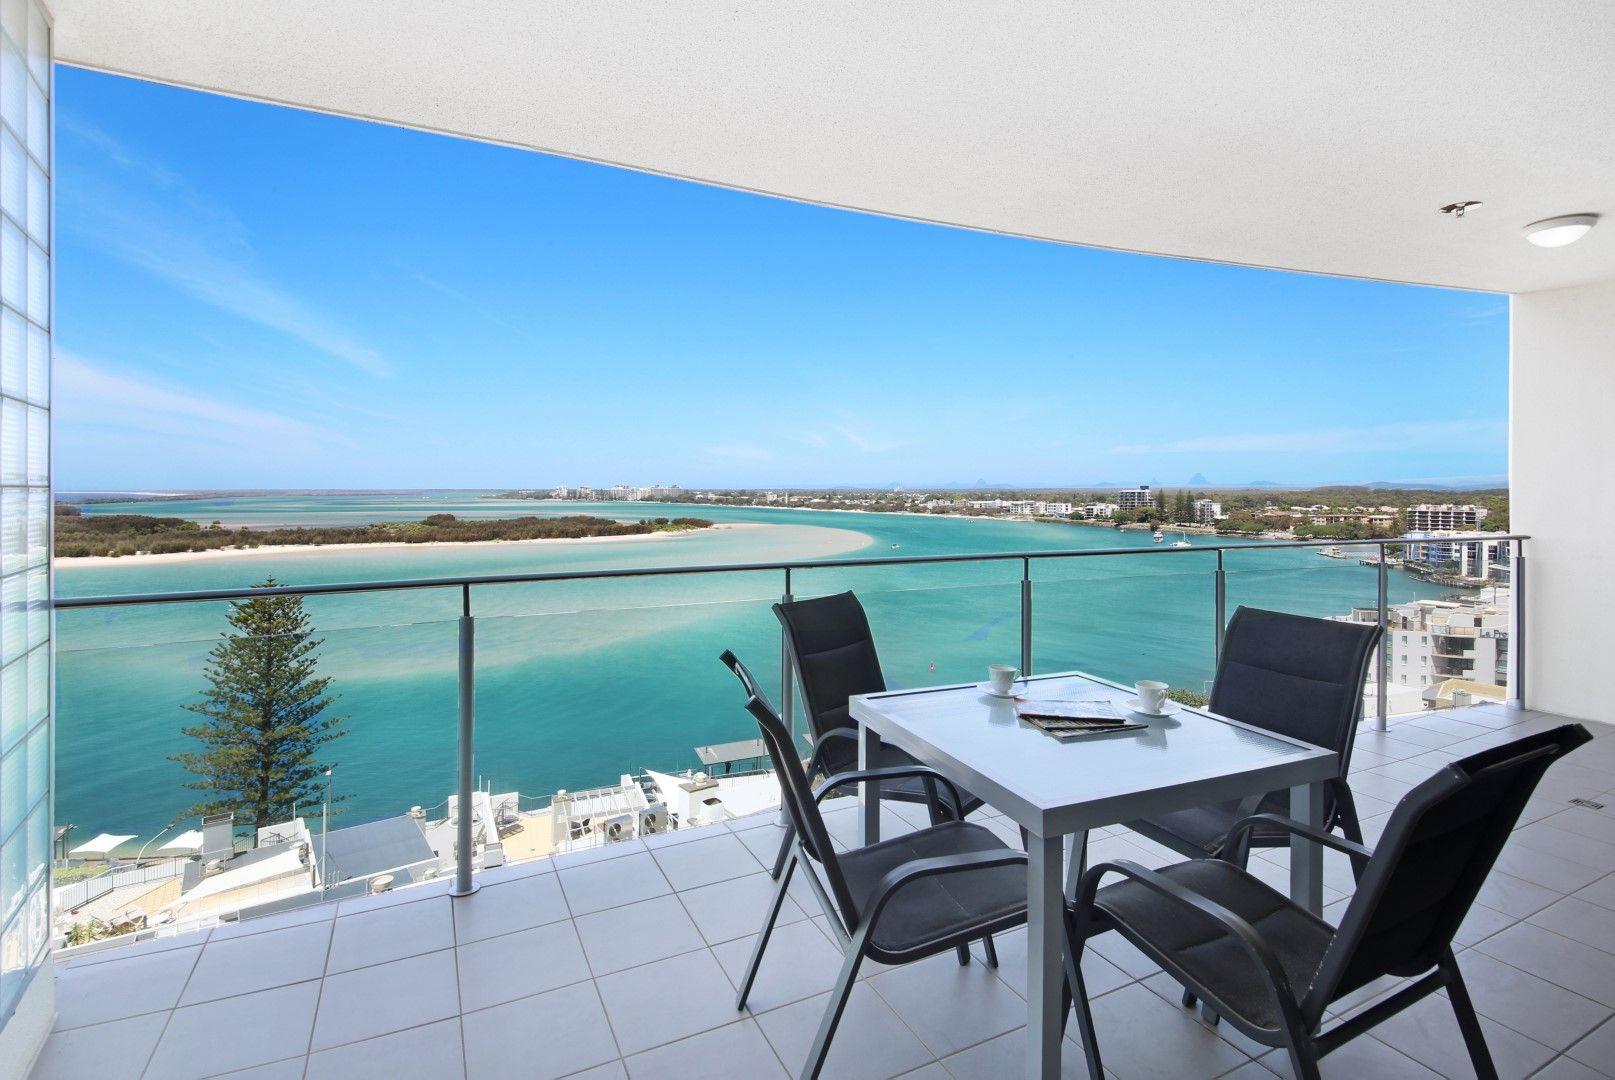 903/12 Otranto Avenue, Caloundra QLD 4551, Image 0